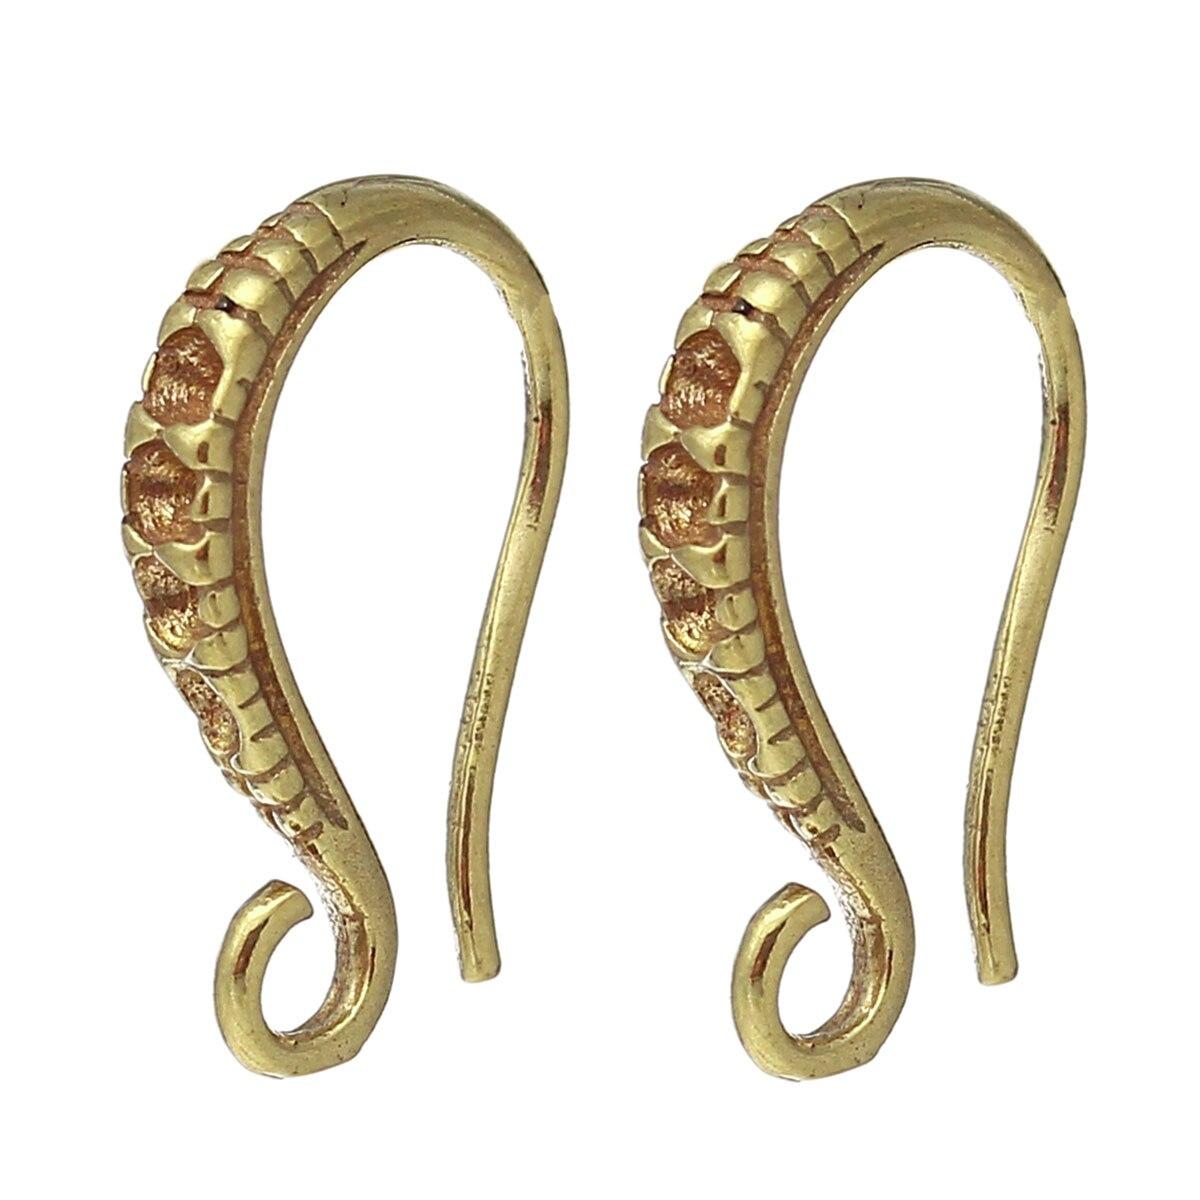 DoreenBeads Copper Earring Components Hooks U-shaped Brass Tone(Fits ss4 Rhinestone)13mm(4/8)x 8mm(3/8),20 Pairs